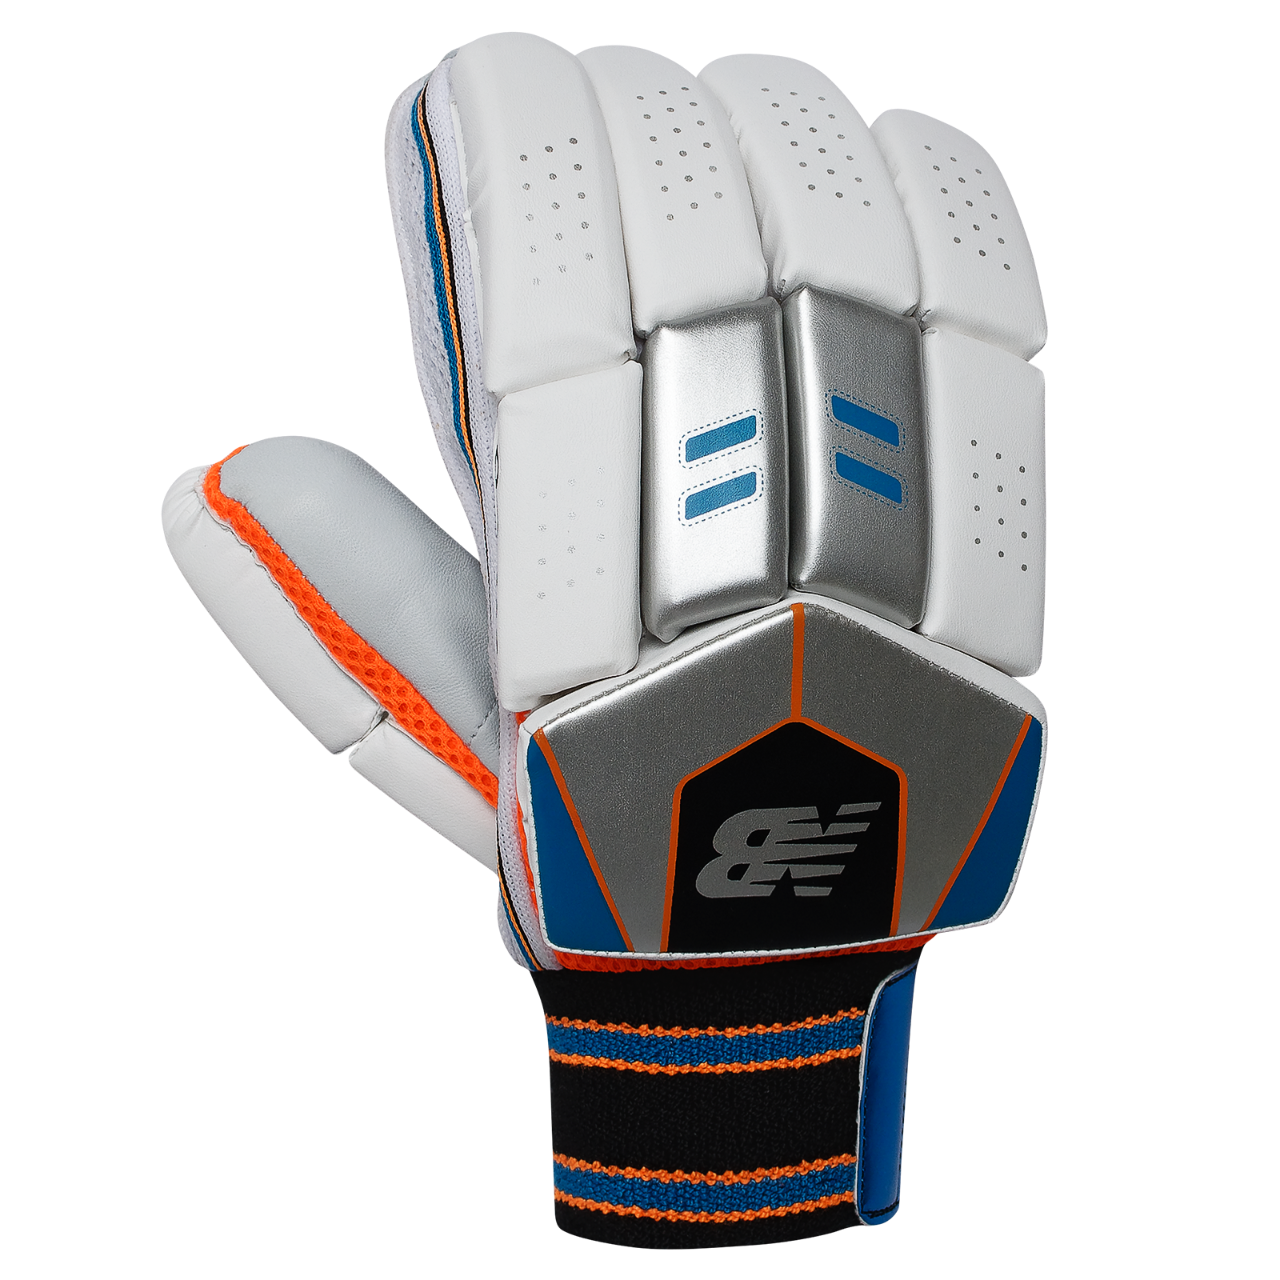 2020 New Balance DC 480 Junior Batting Gloves